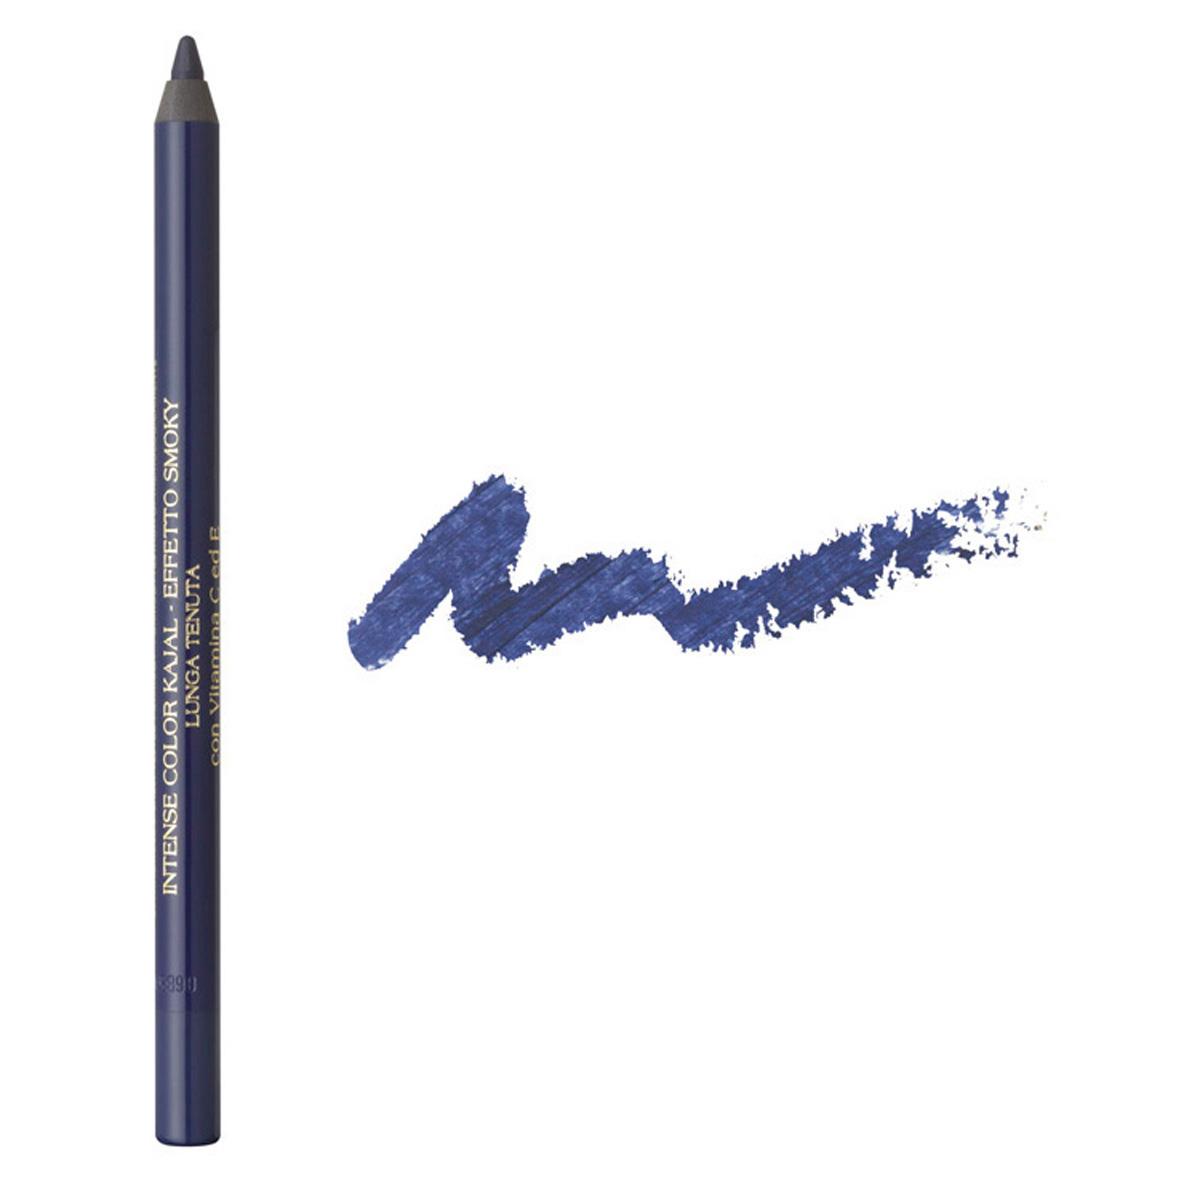 Creion de ochi Kajal cu vitamina C si E